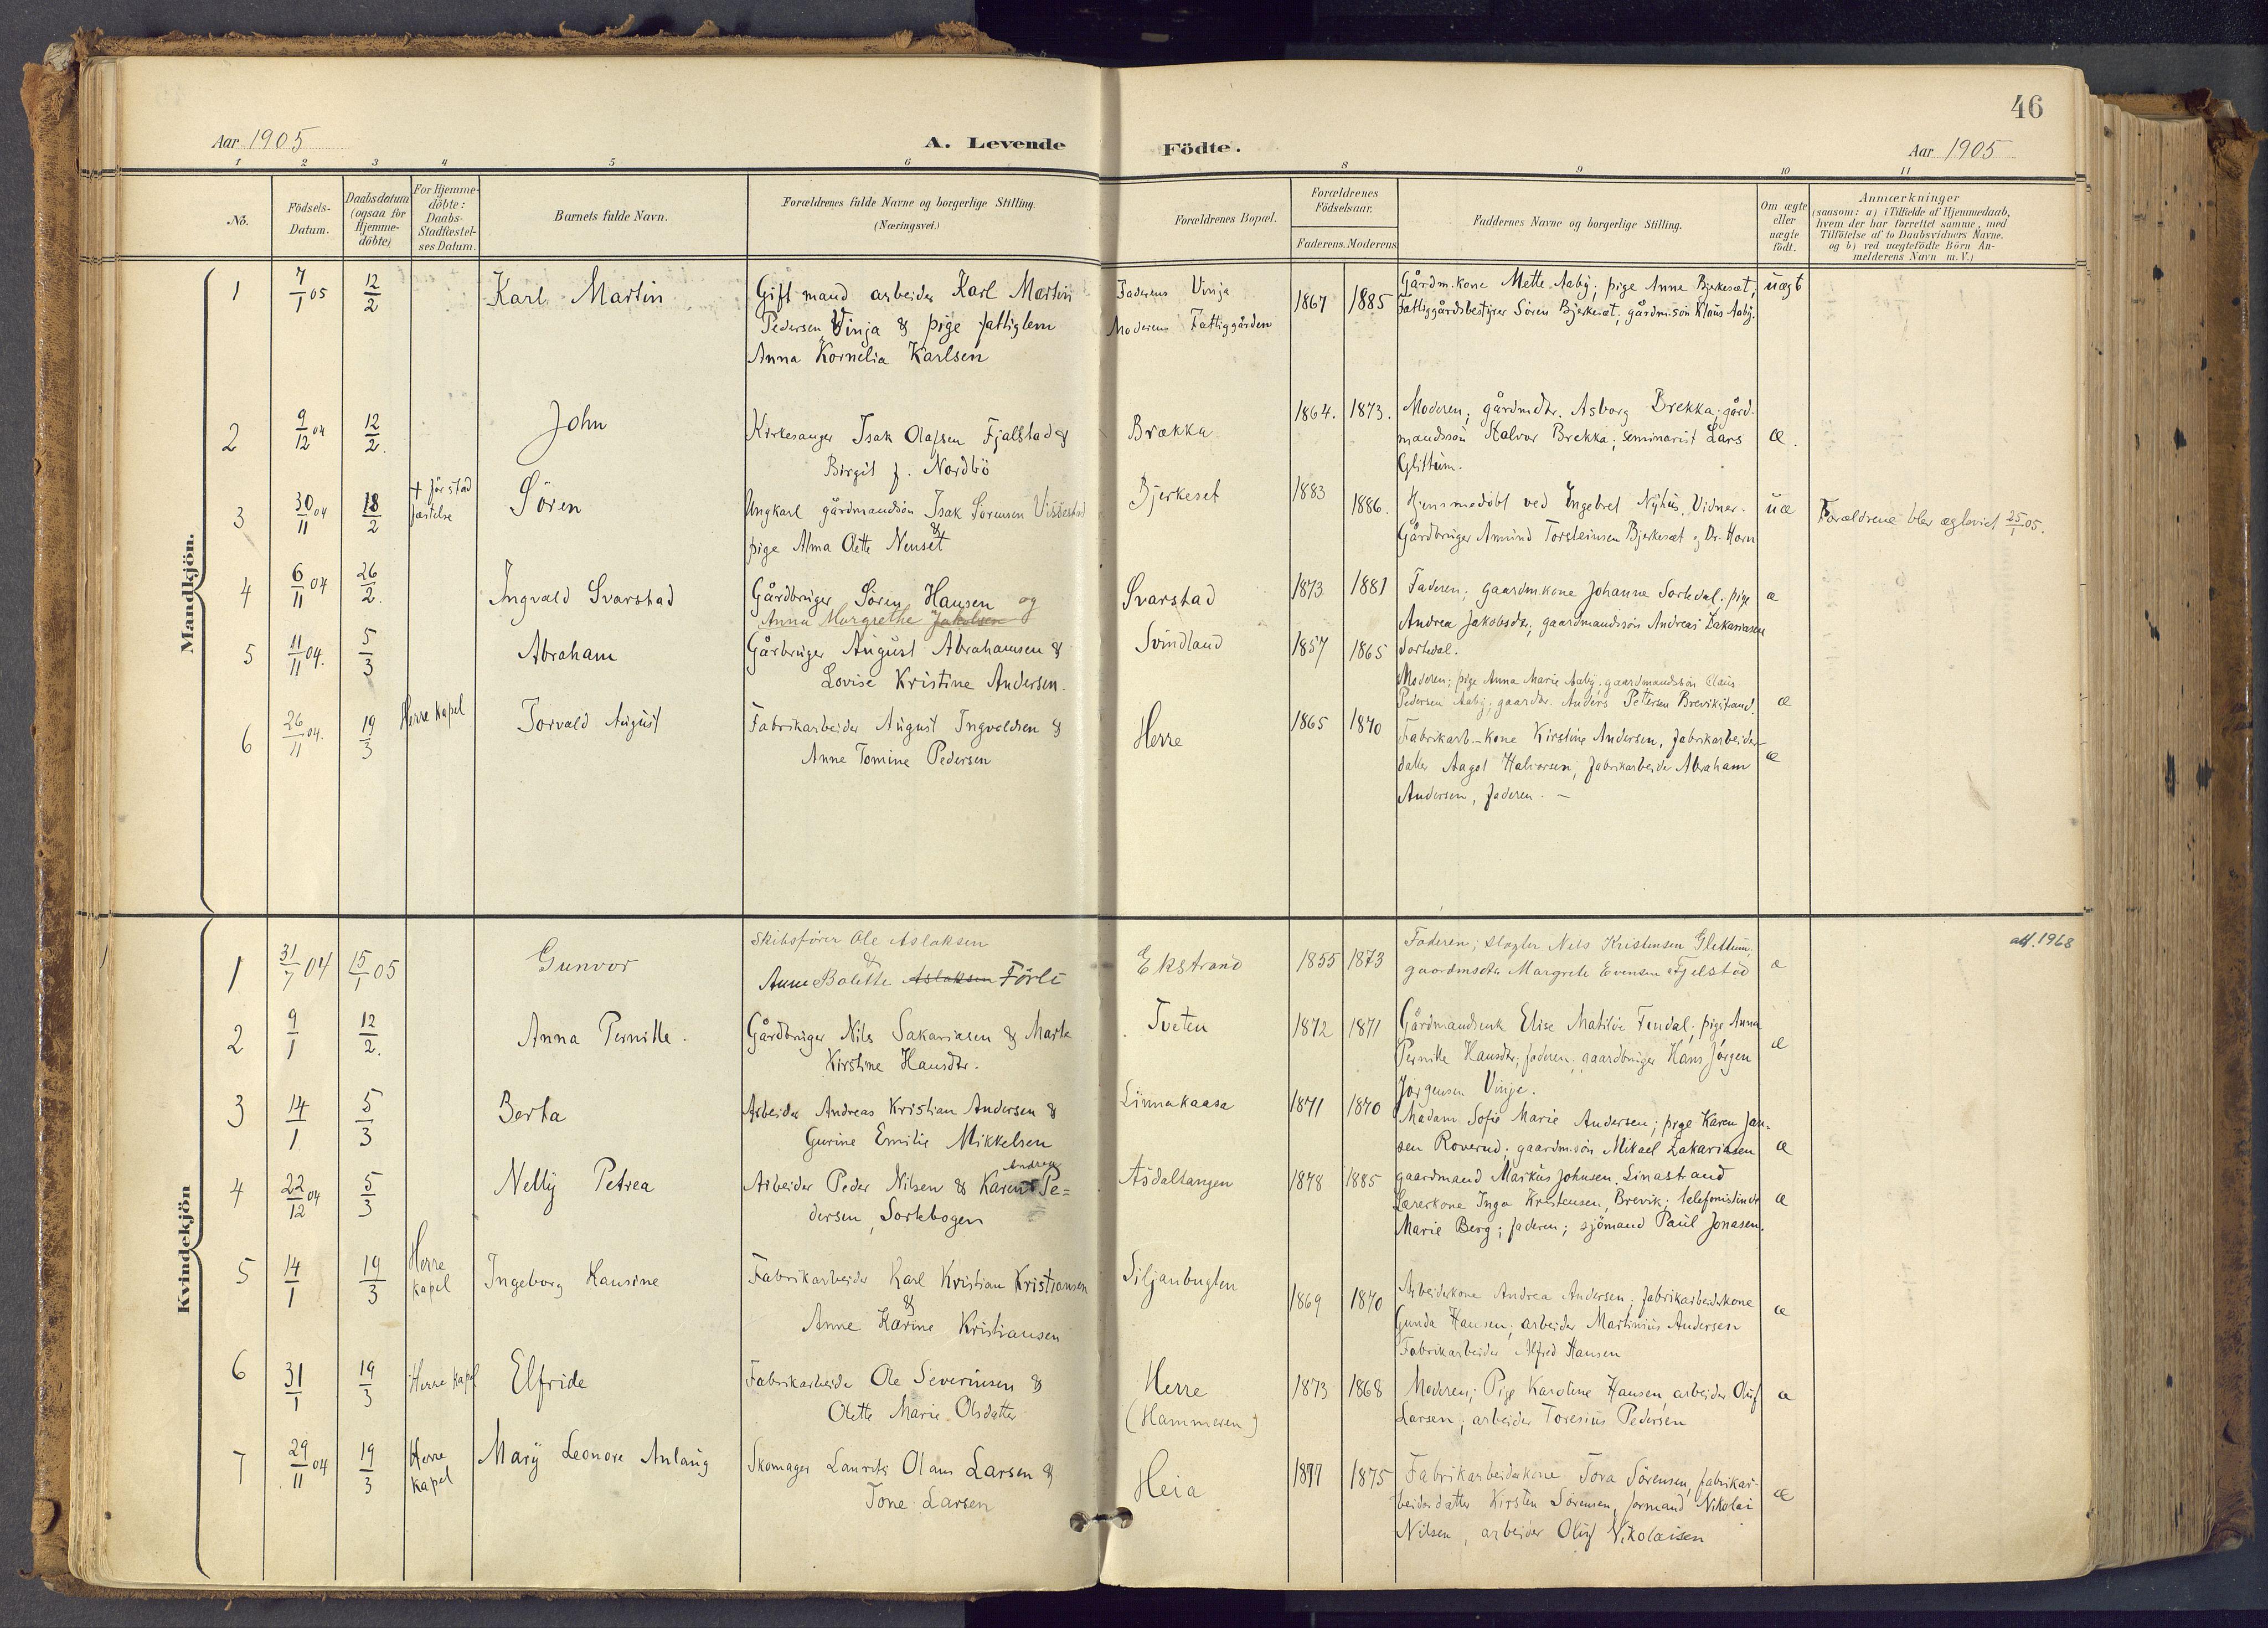 SAKO, Bamble kirkebøker, F/Fa/L0009: Ministerialbok nr. I 9, 1901-1917, s. 46